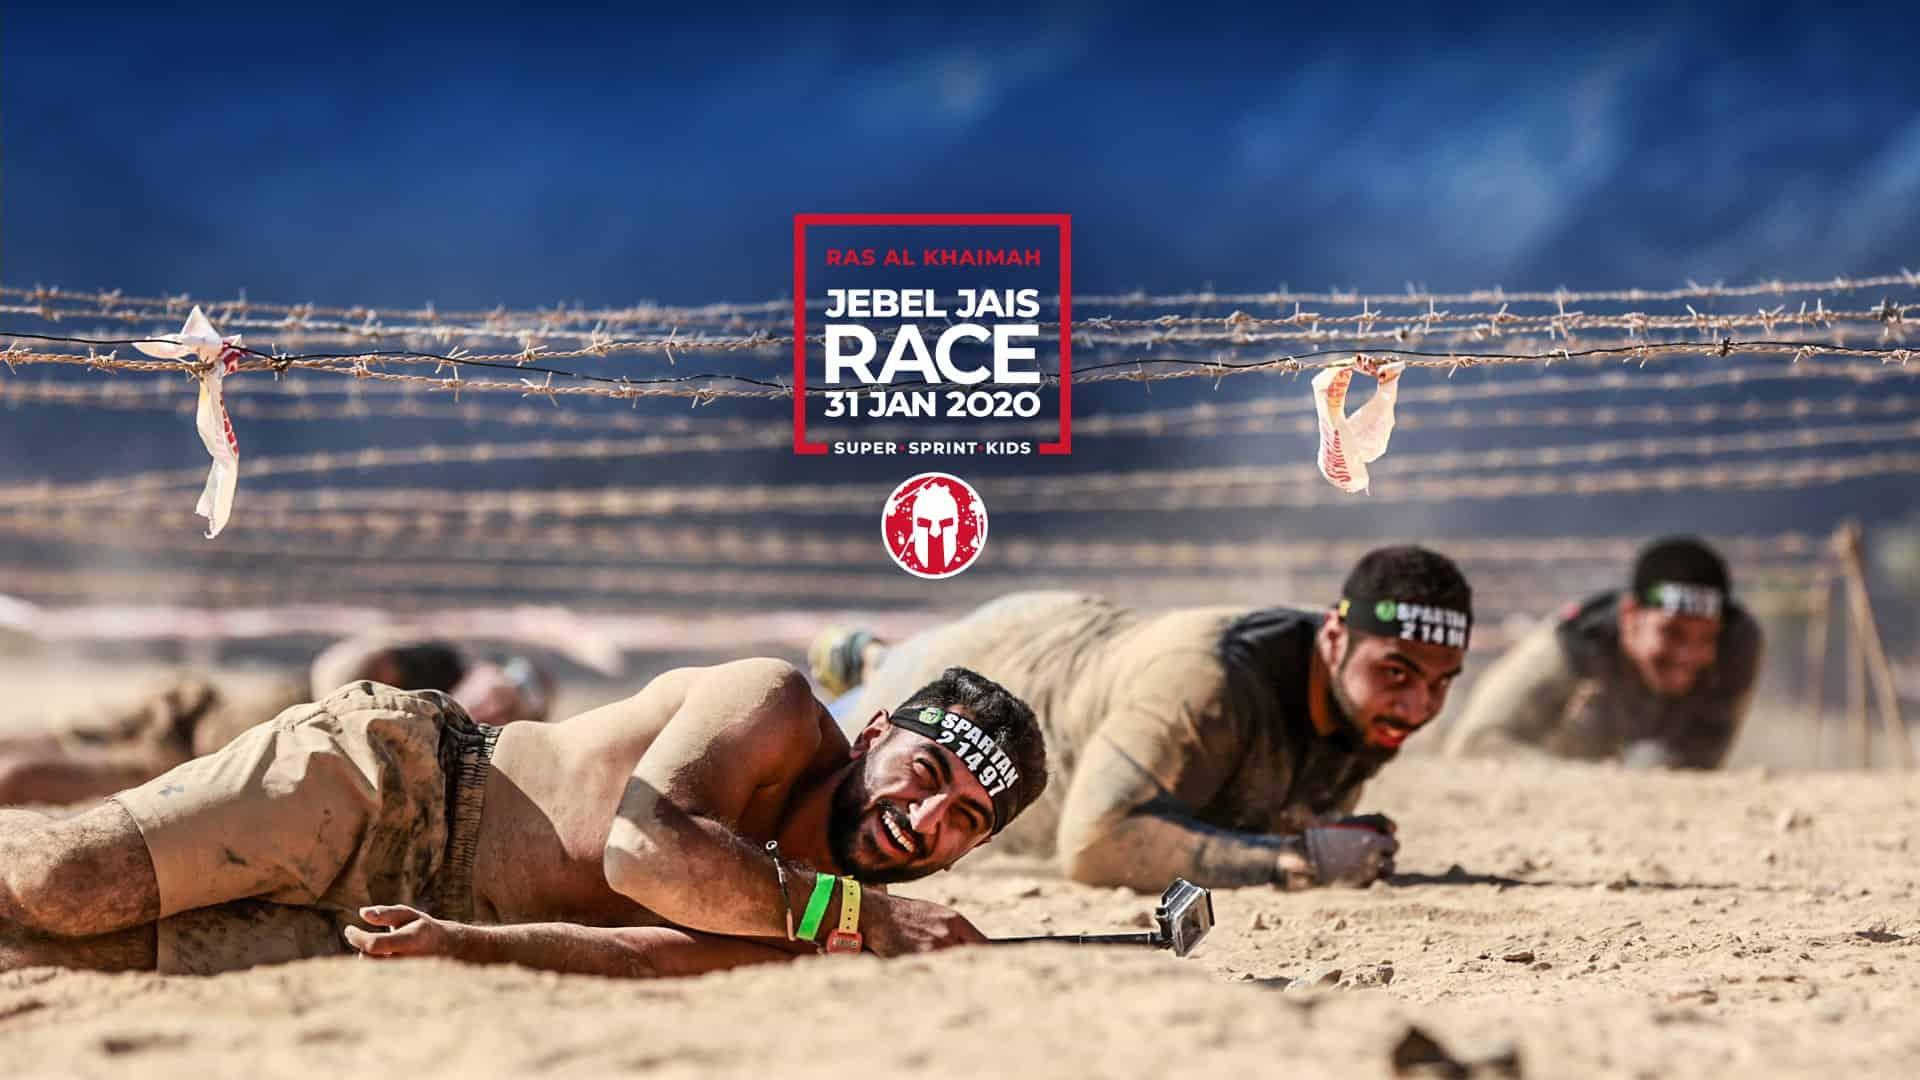 Spartan Jebel Jais Race Ras Al Khaimah